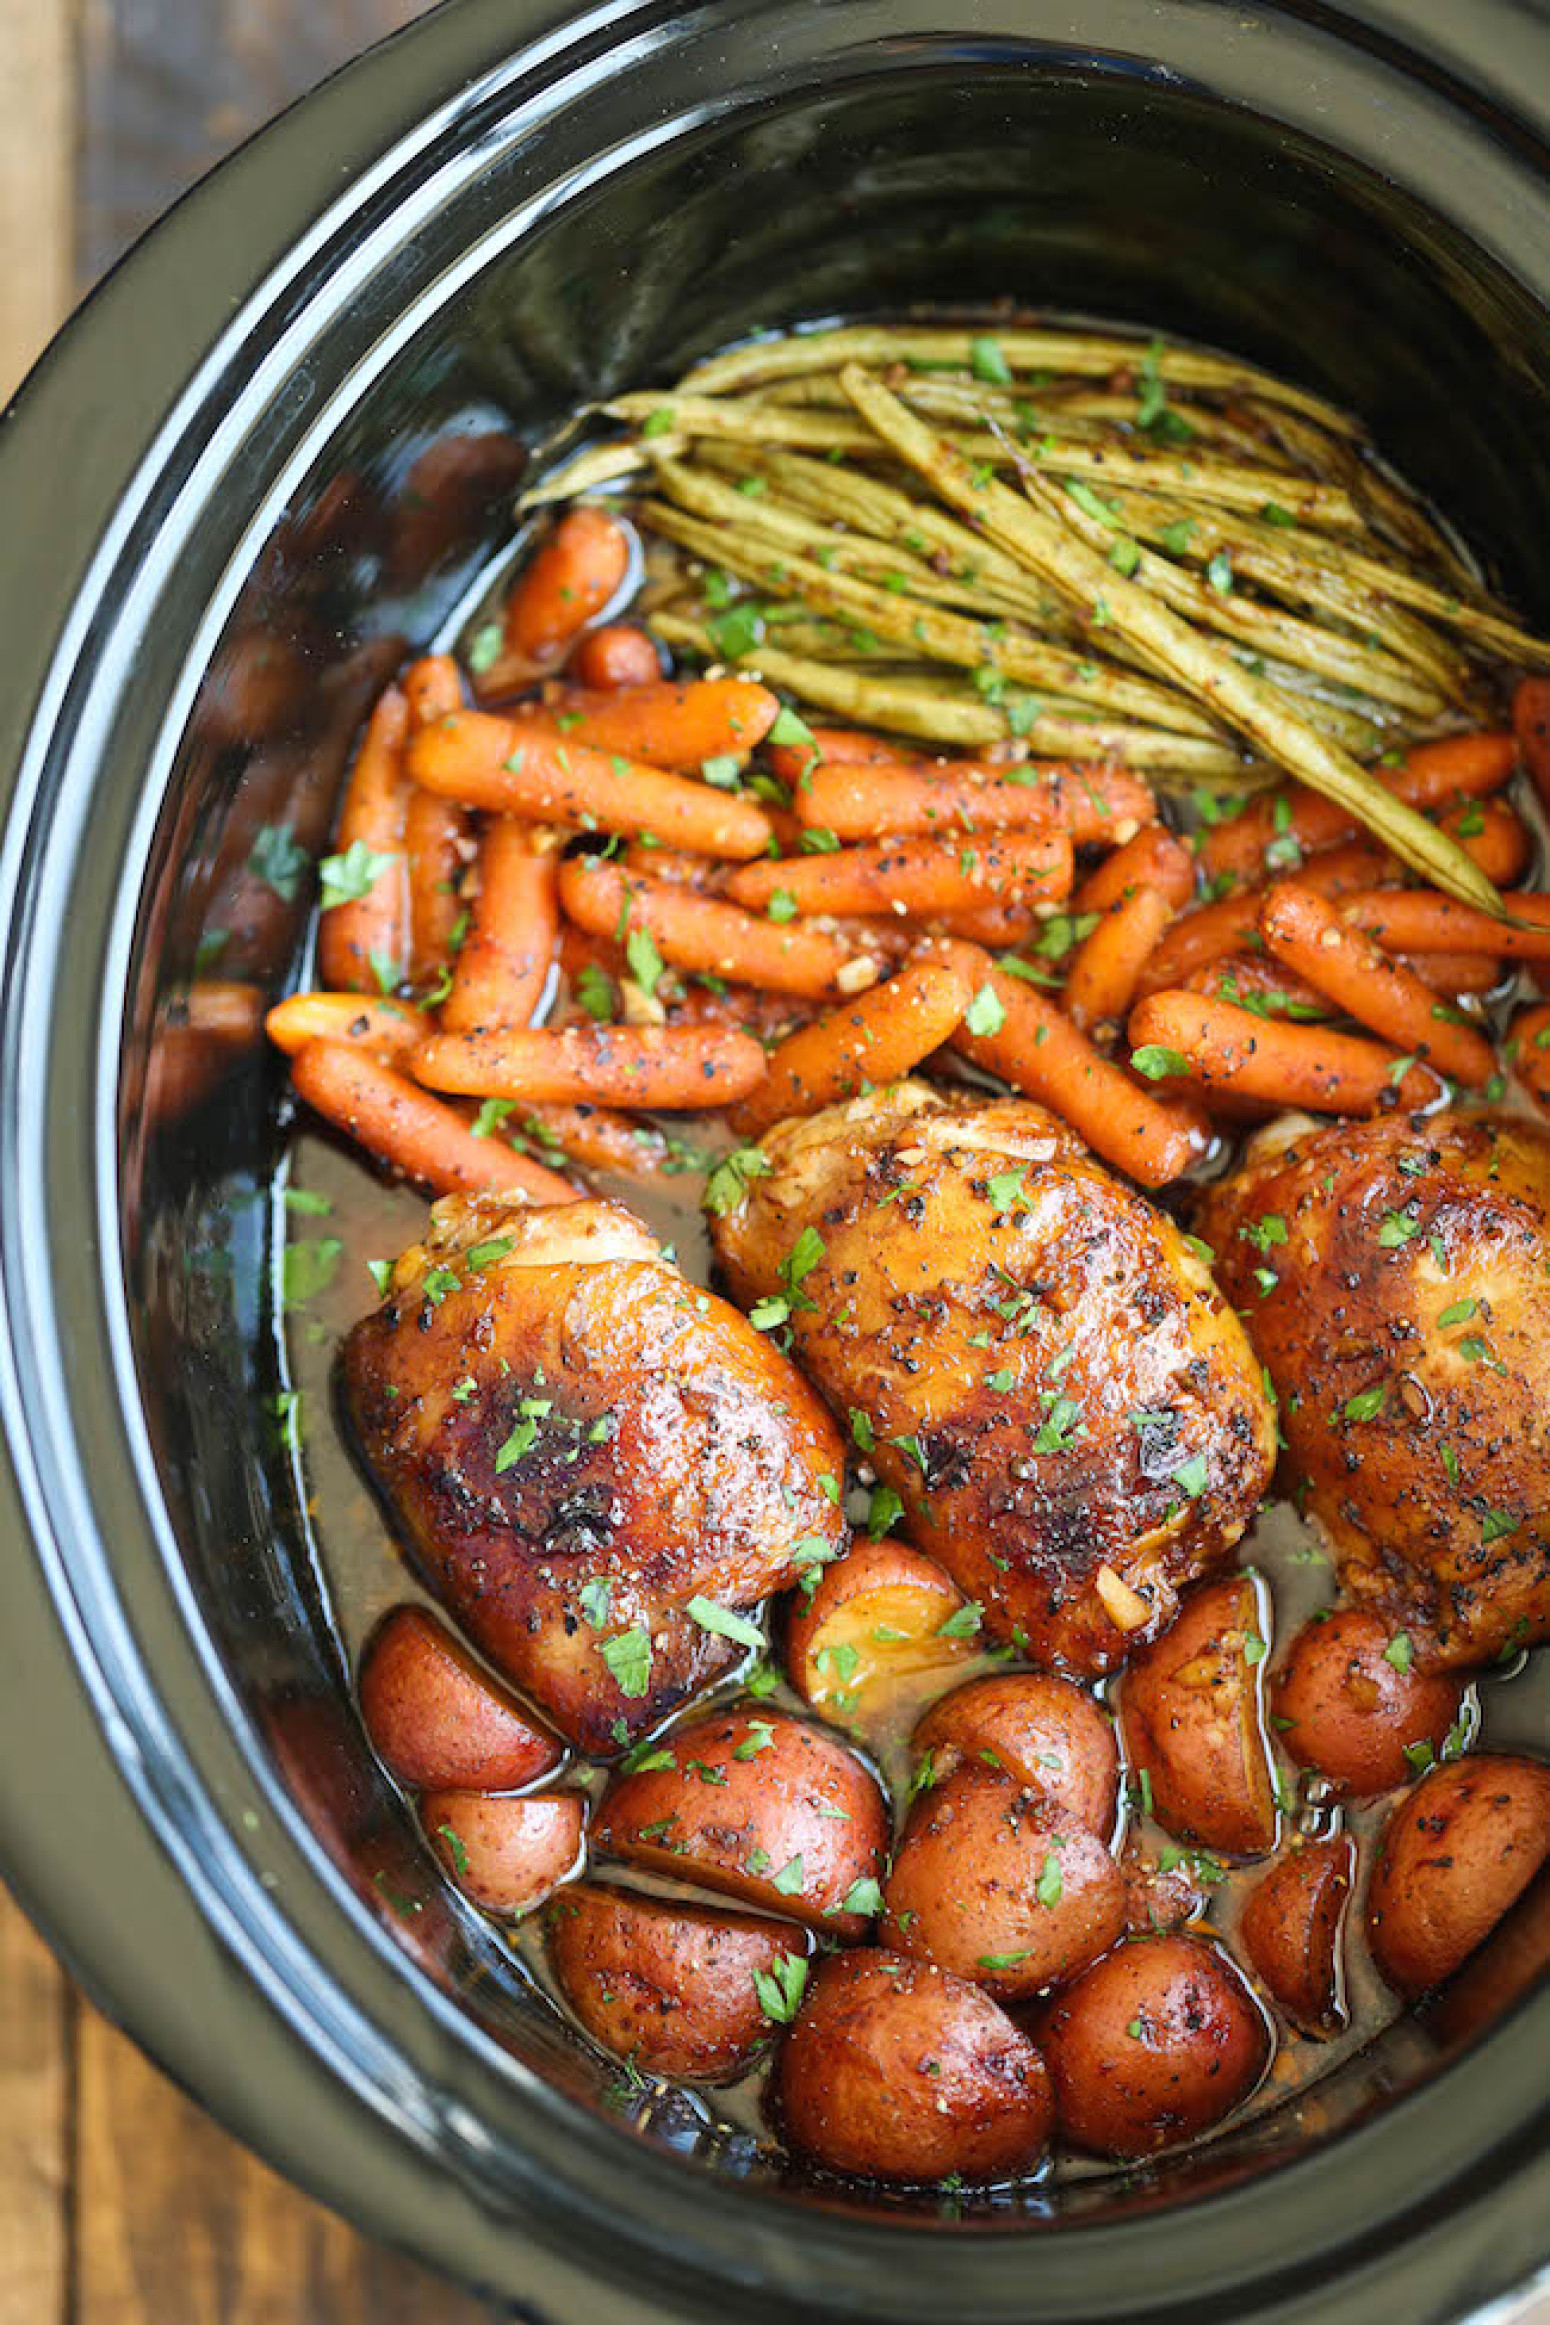 Slow Cooker Honey Garlic Chicken and Veggies Recipe | Just ...